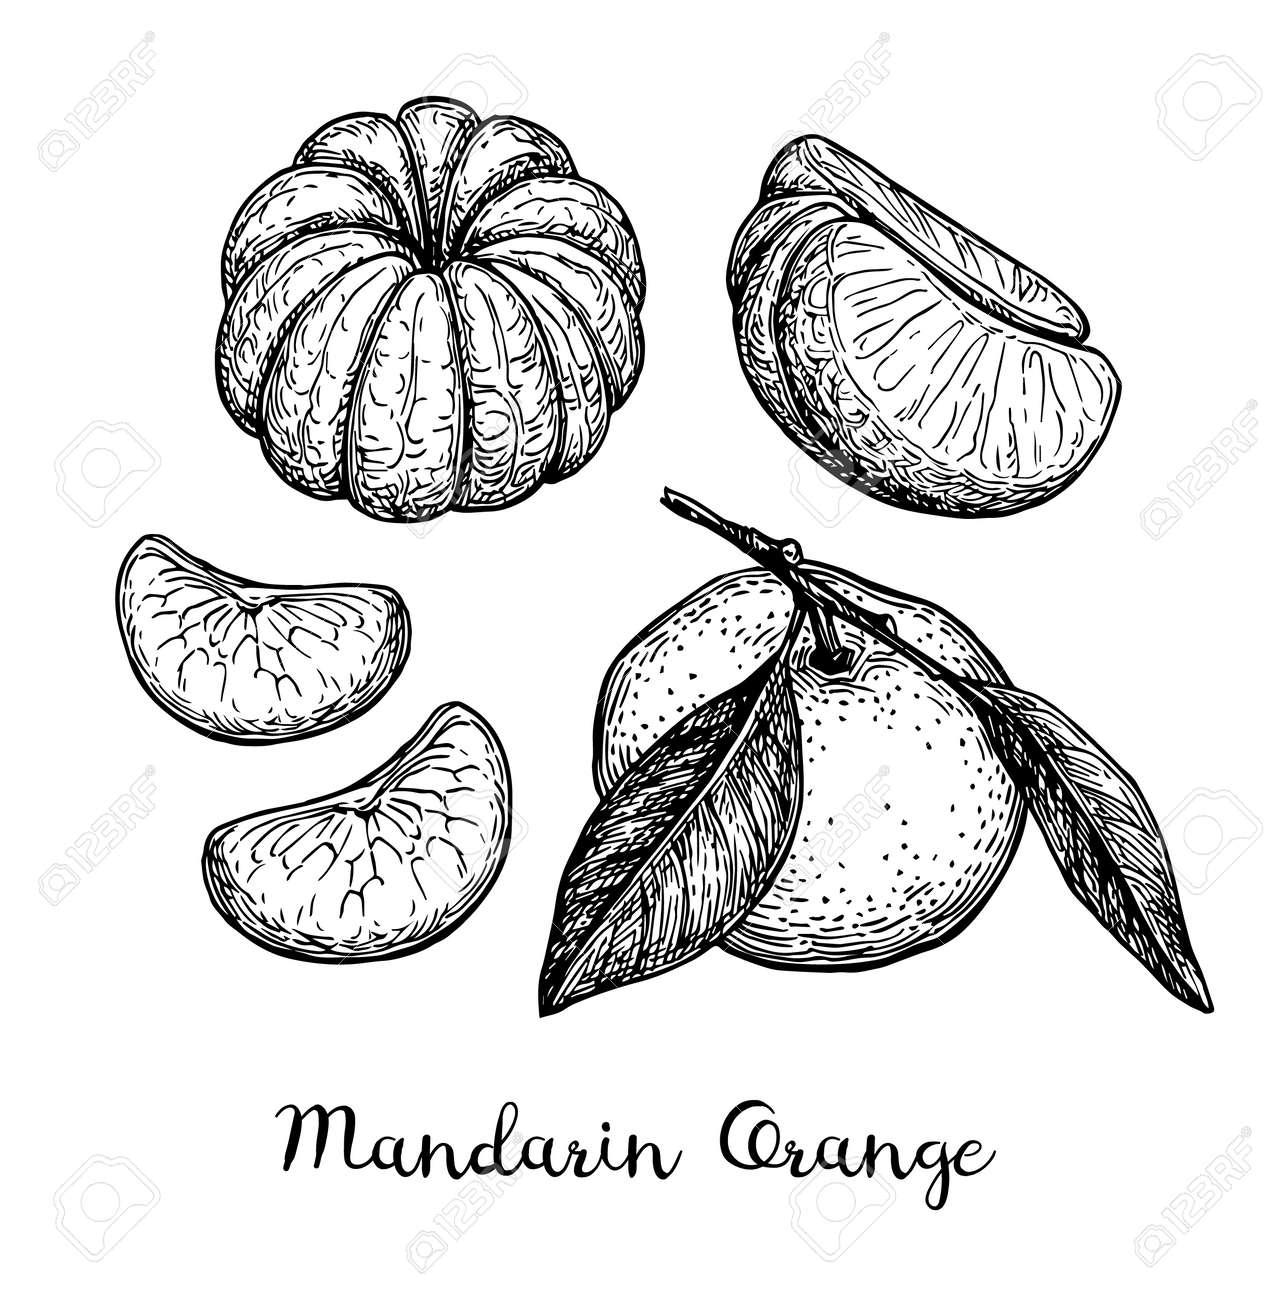 Mandarin orange set. Ink sketch isolated on white background. Hand drawn vector illustration. Retro style. - 93833151